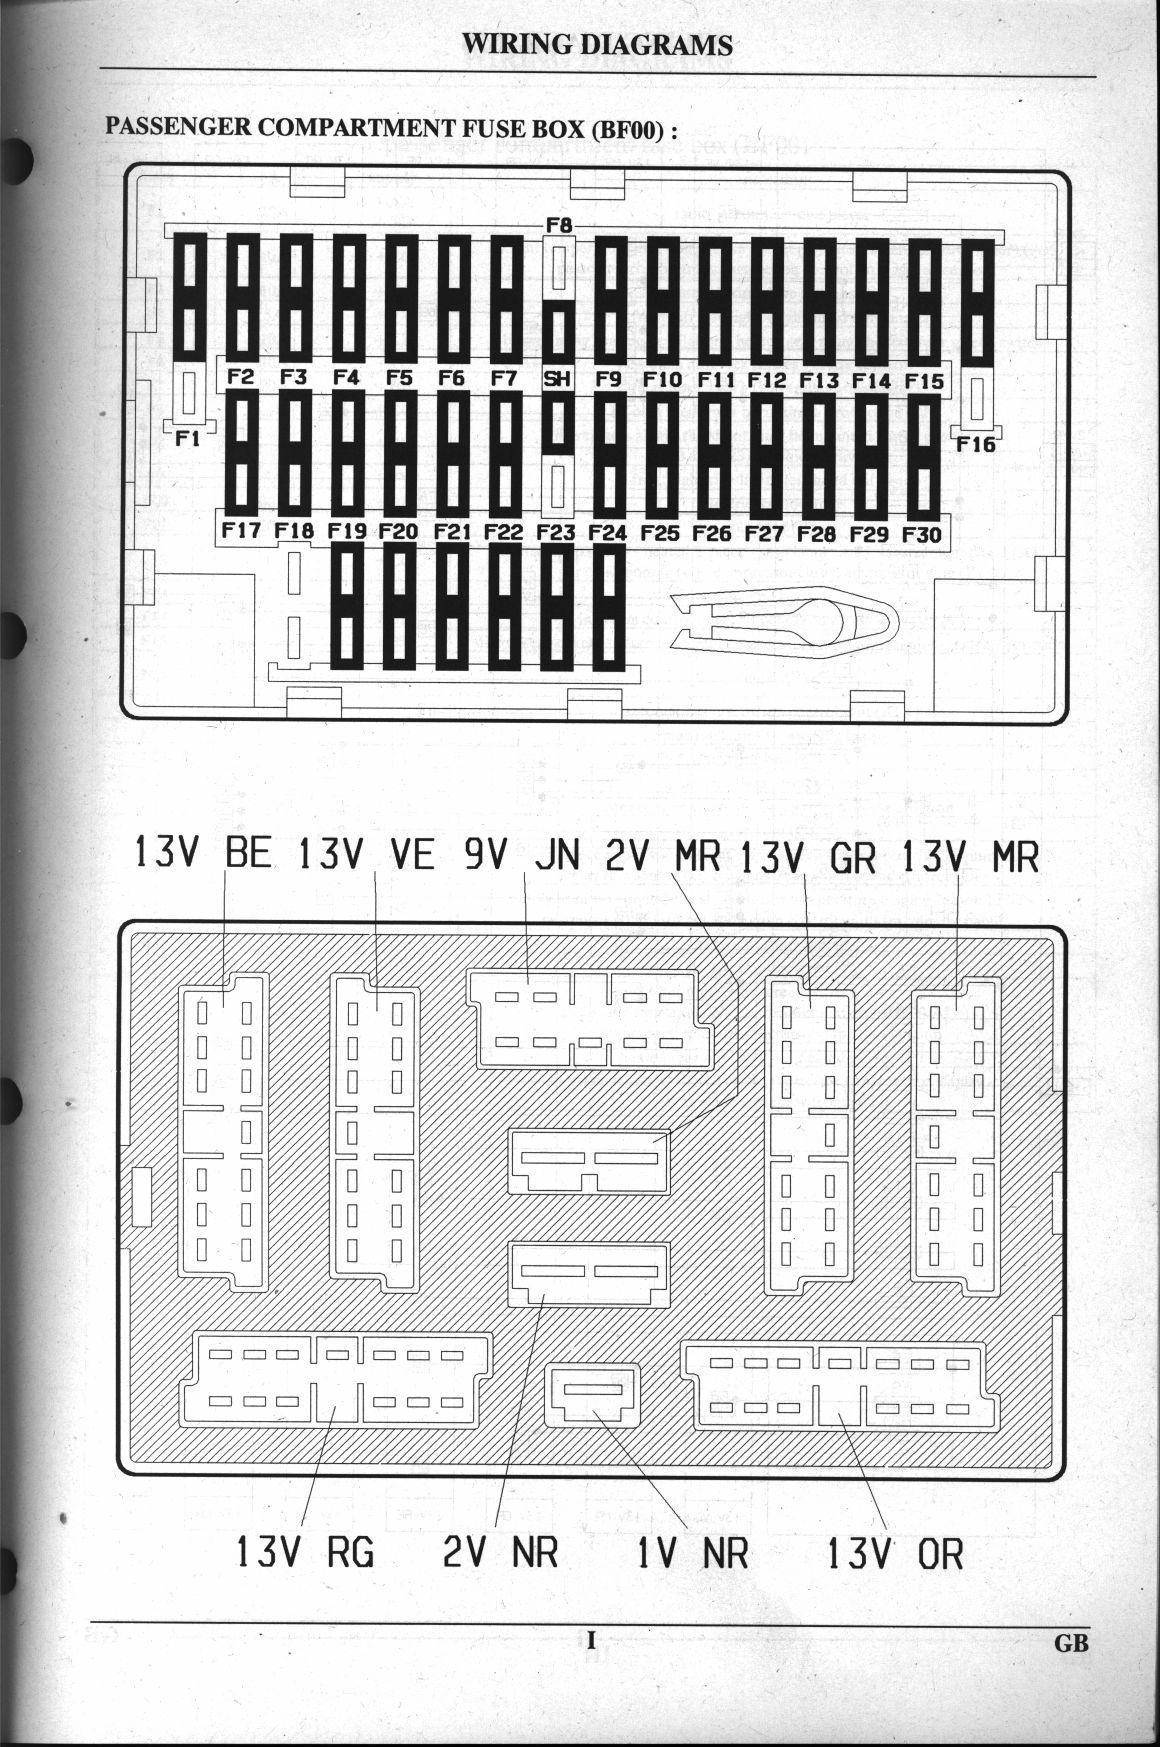 citroen berlingo wiring diagram split type air conditioning fuse box on a synergie schematic diagramcitroen diagrams hubs mercruiser